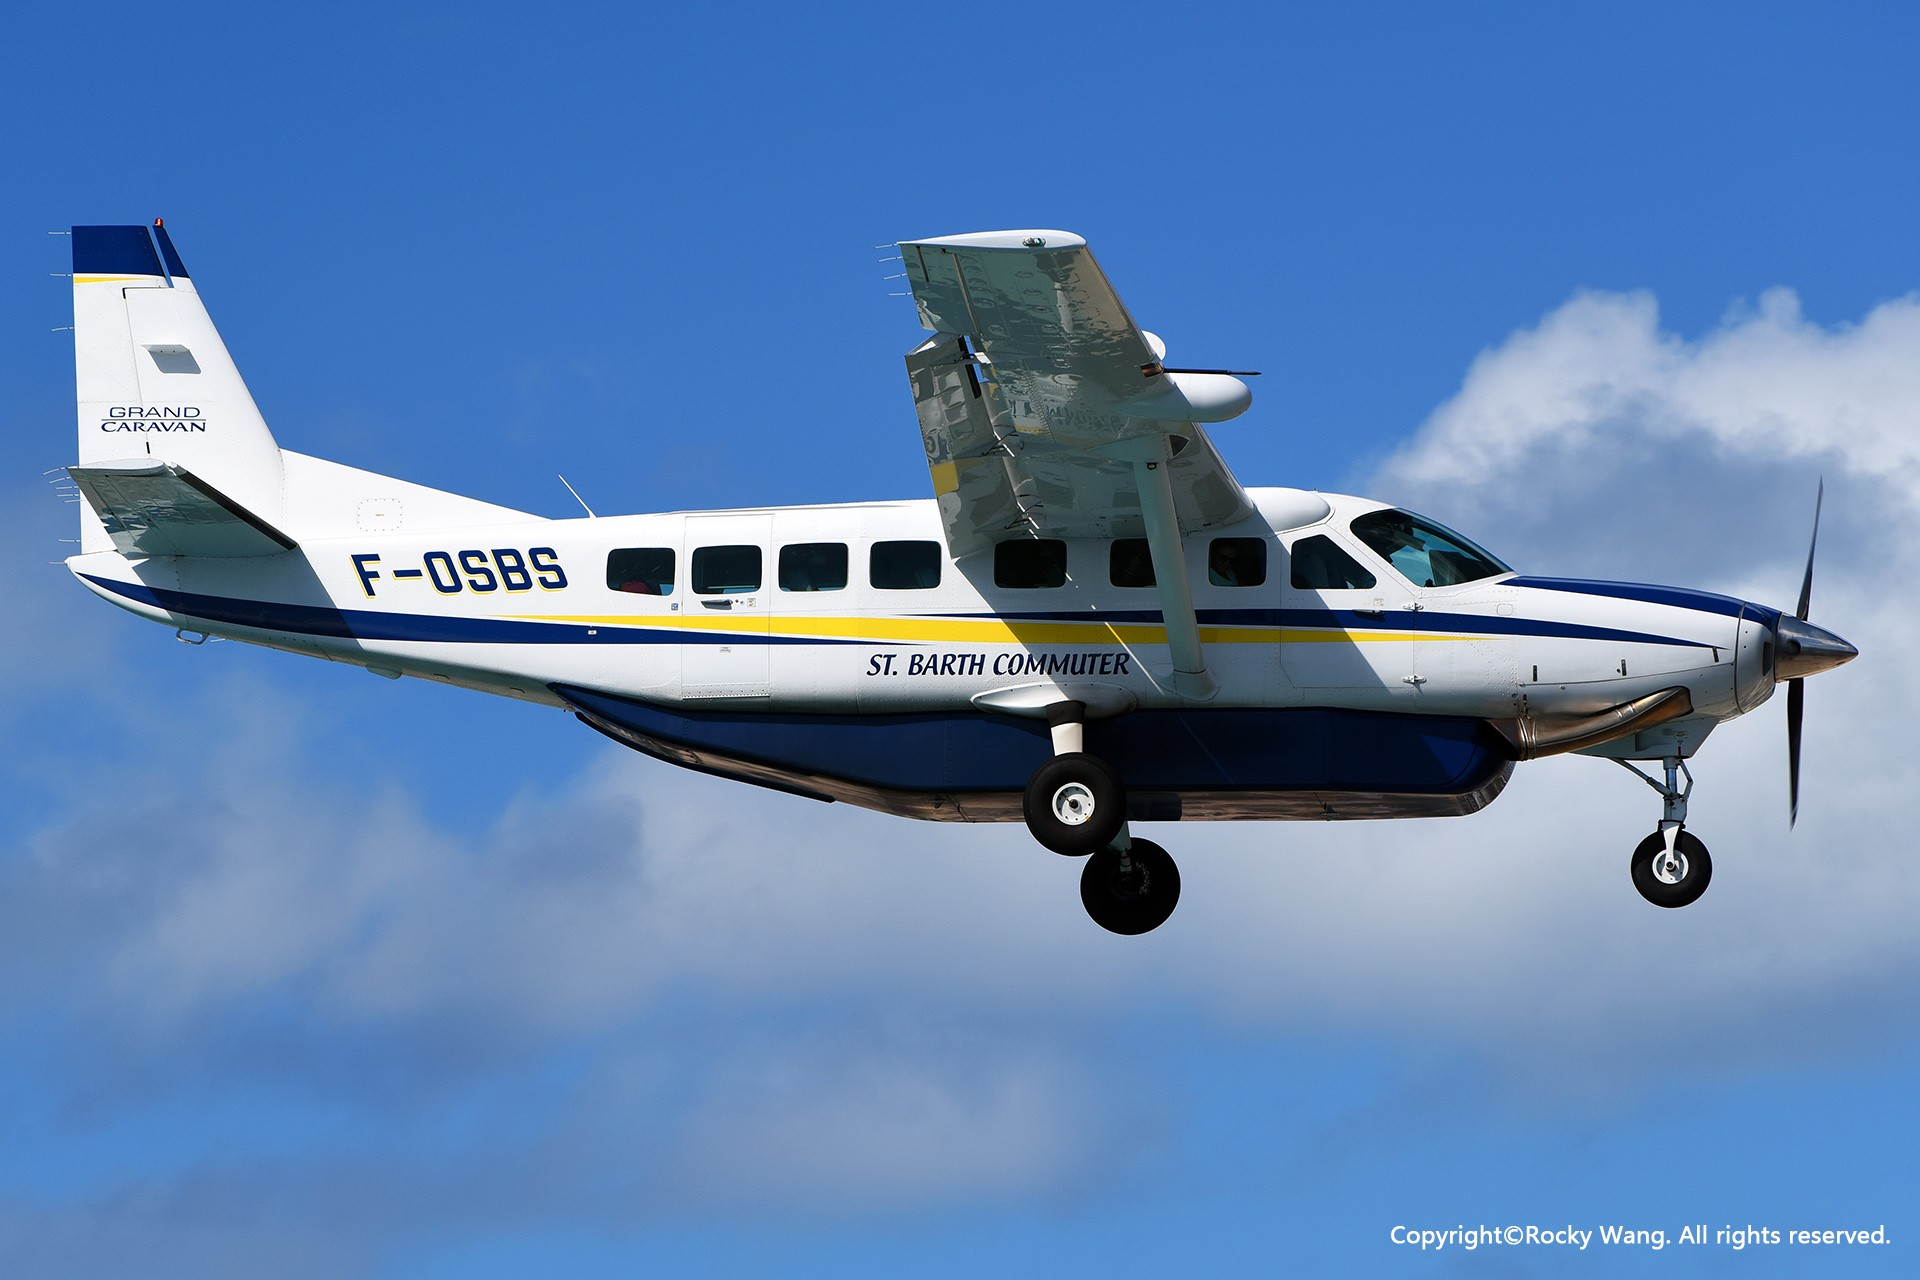 Re:[原创]My endless Caribbean dream——圣马丁朱莉安娜公主机场拍机记 CESSNA 208B GRAND CARAVAN F-OSBS 荷属安的列斯群岛朱利安娜公主机场